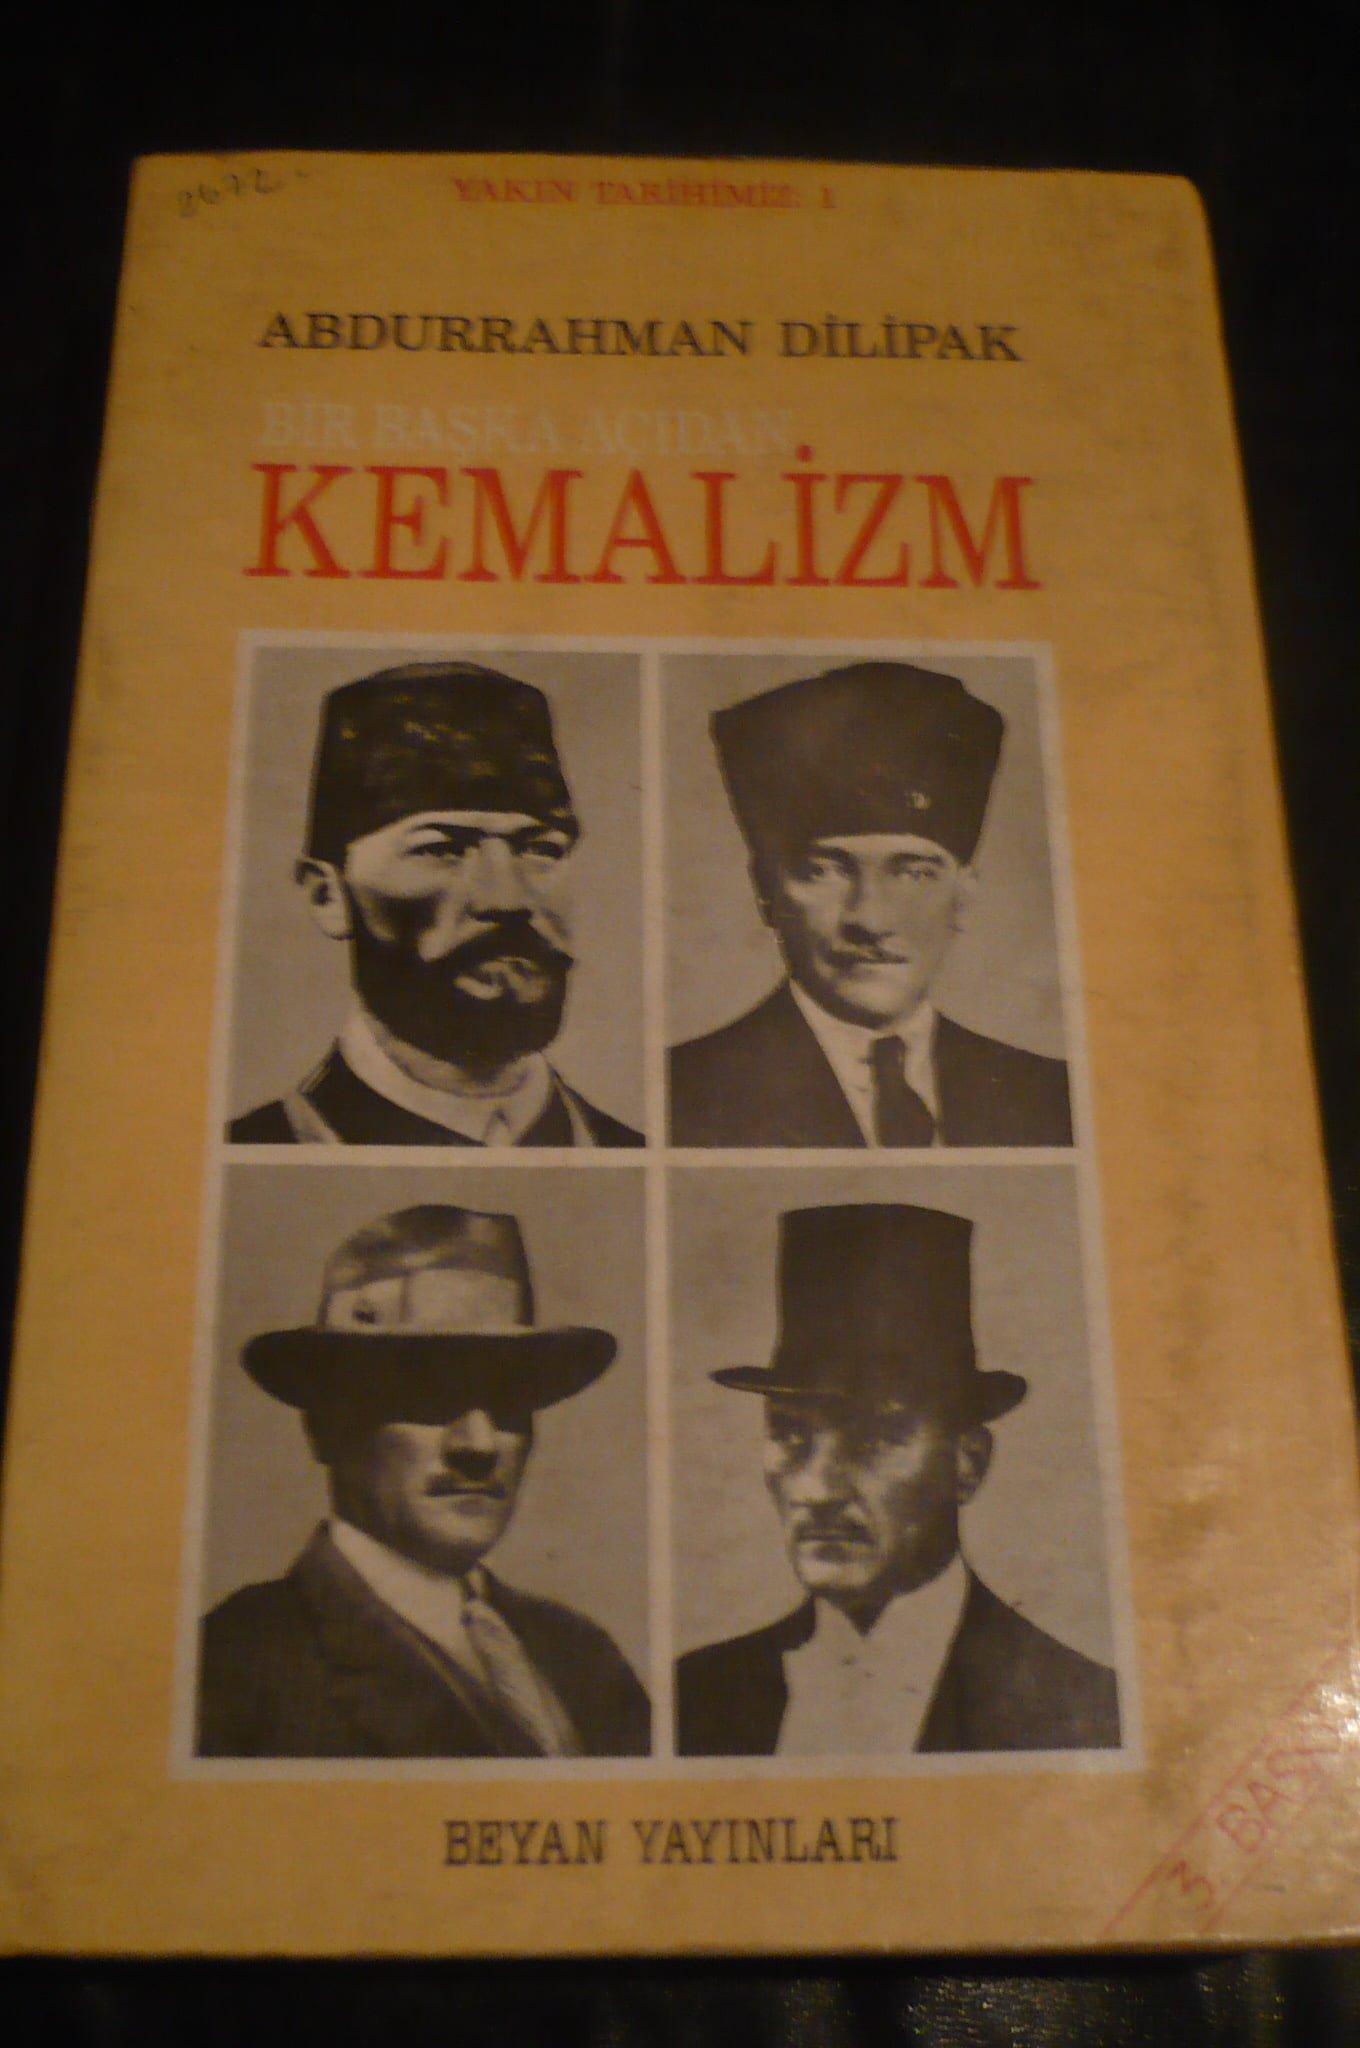 BİR BAŞKA AÇIDAN KEMALİZM/ A.Dilipak/15 tl